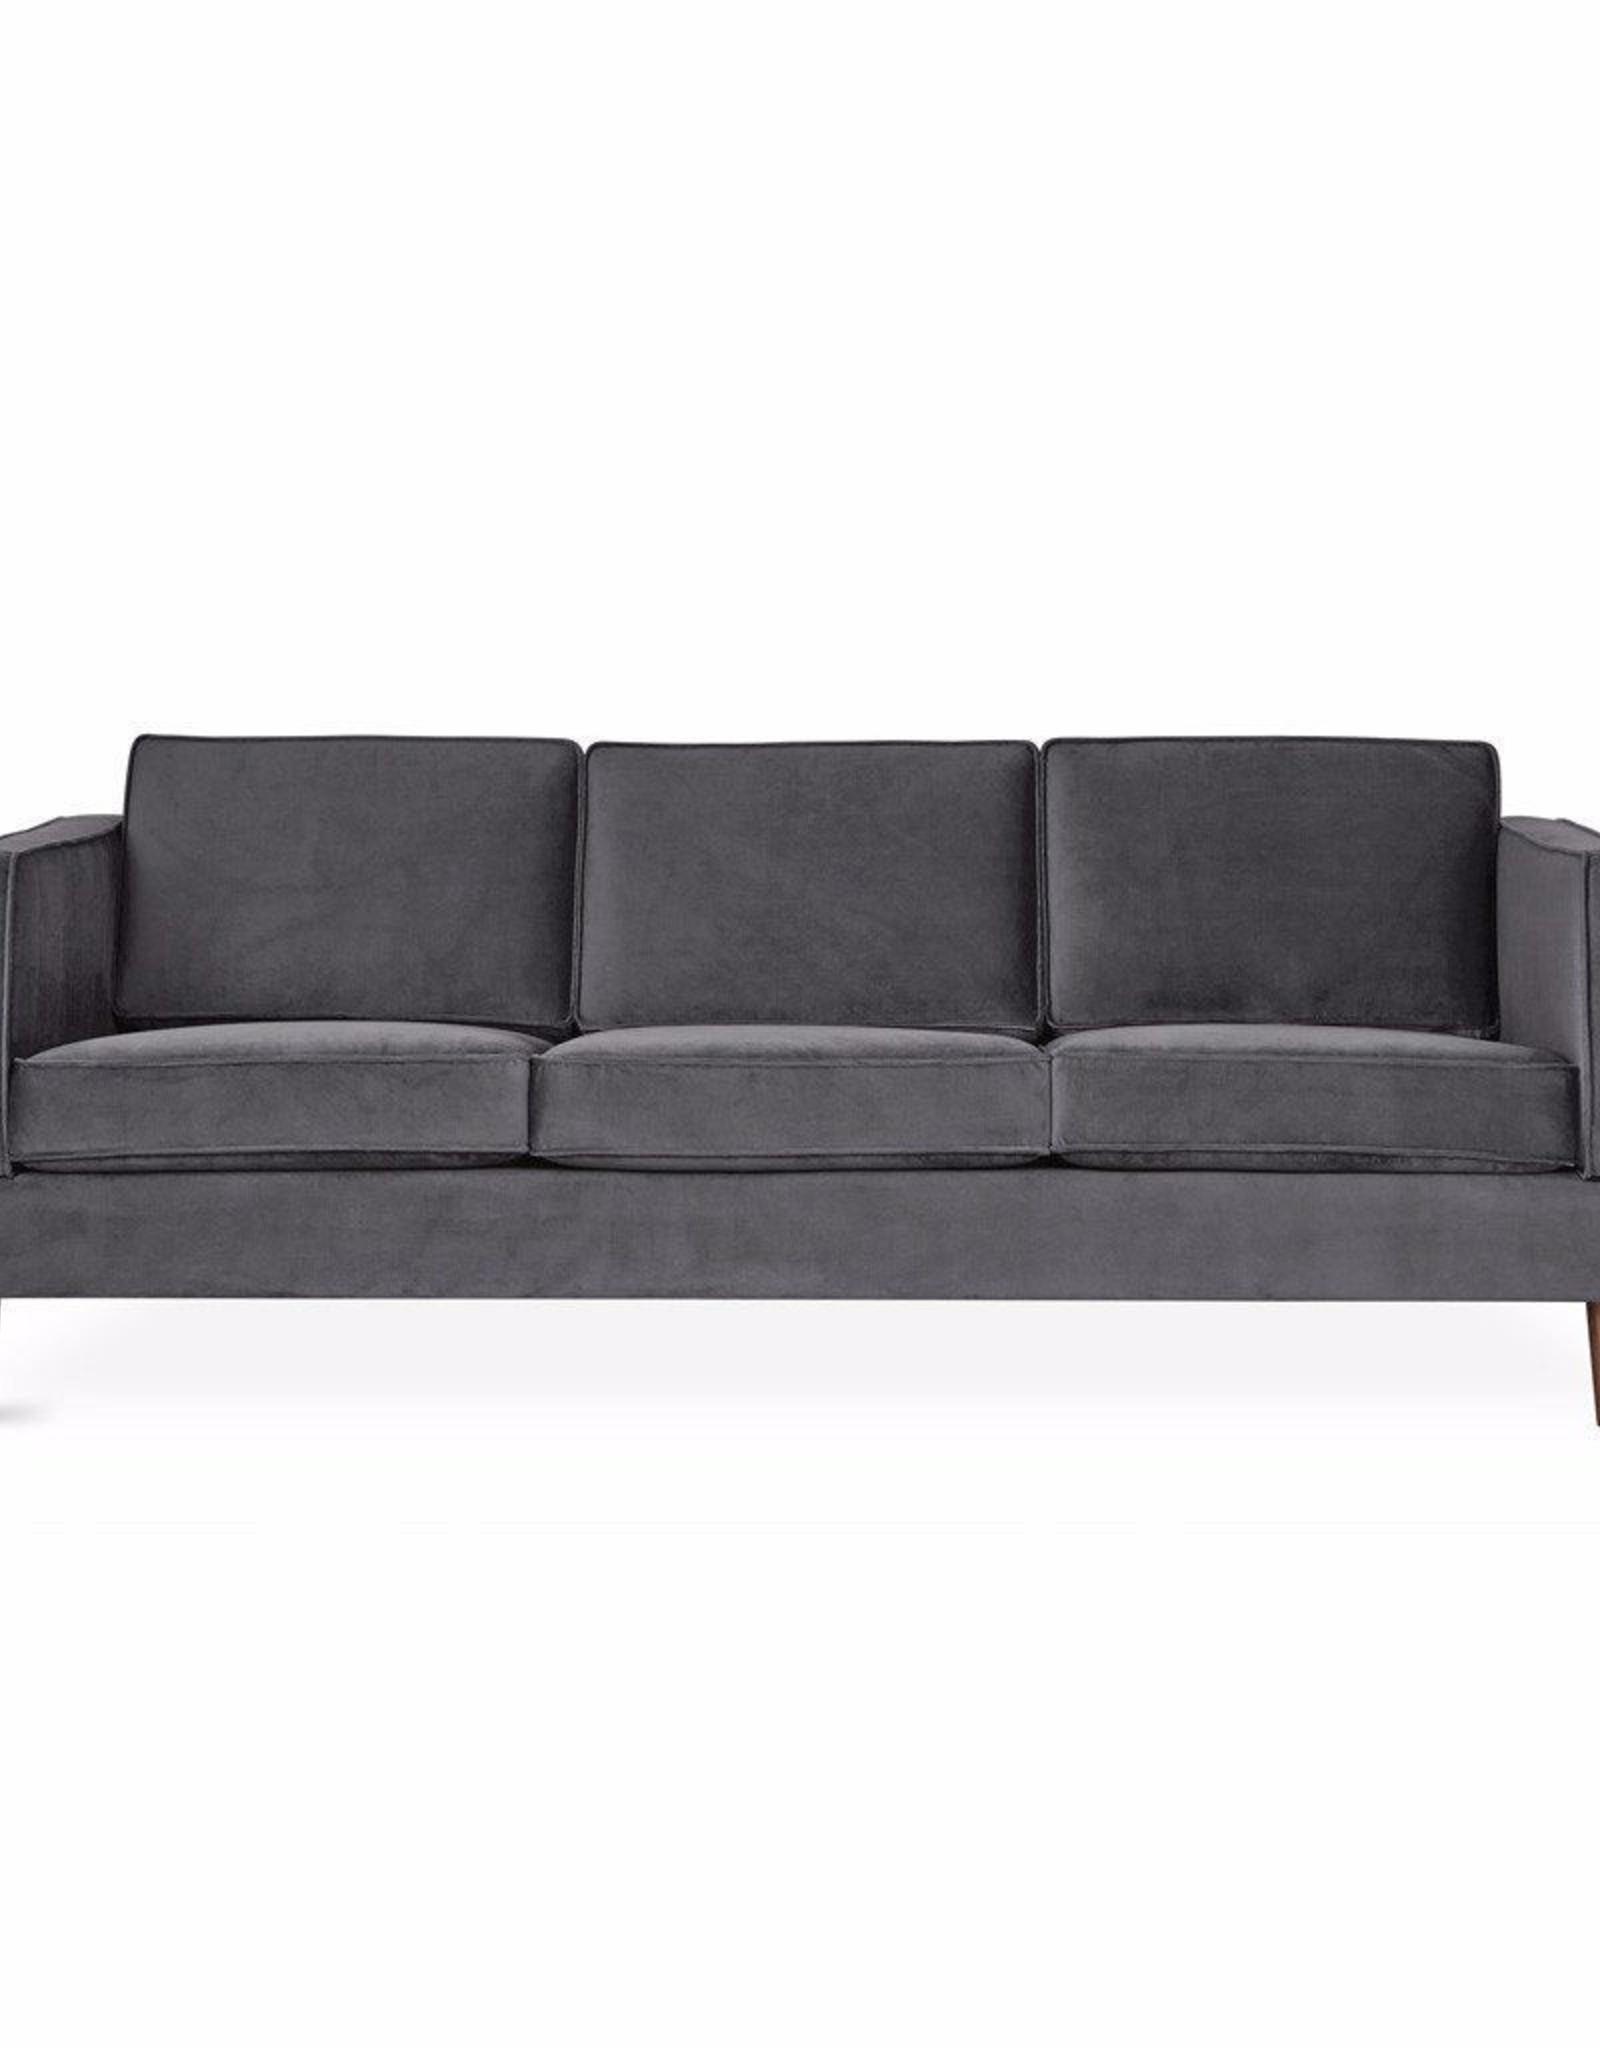 Gus* Modern Adelaide Sofa